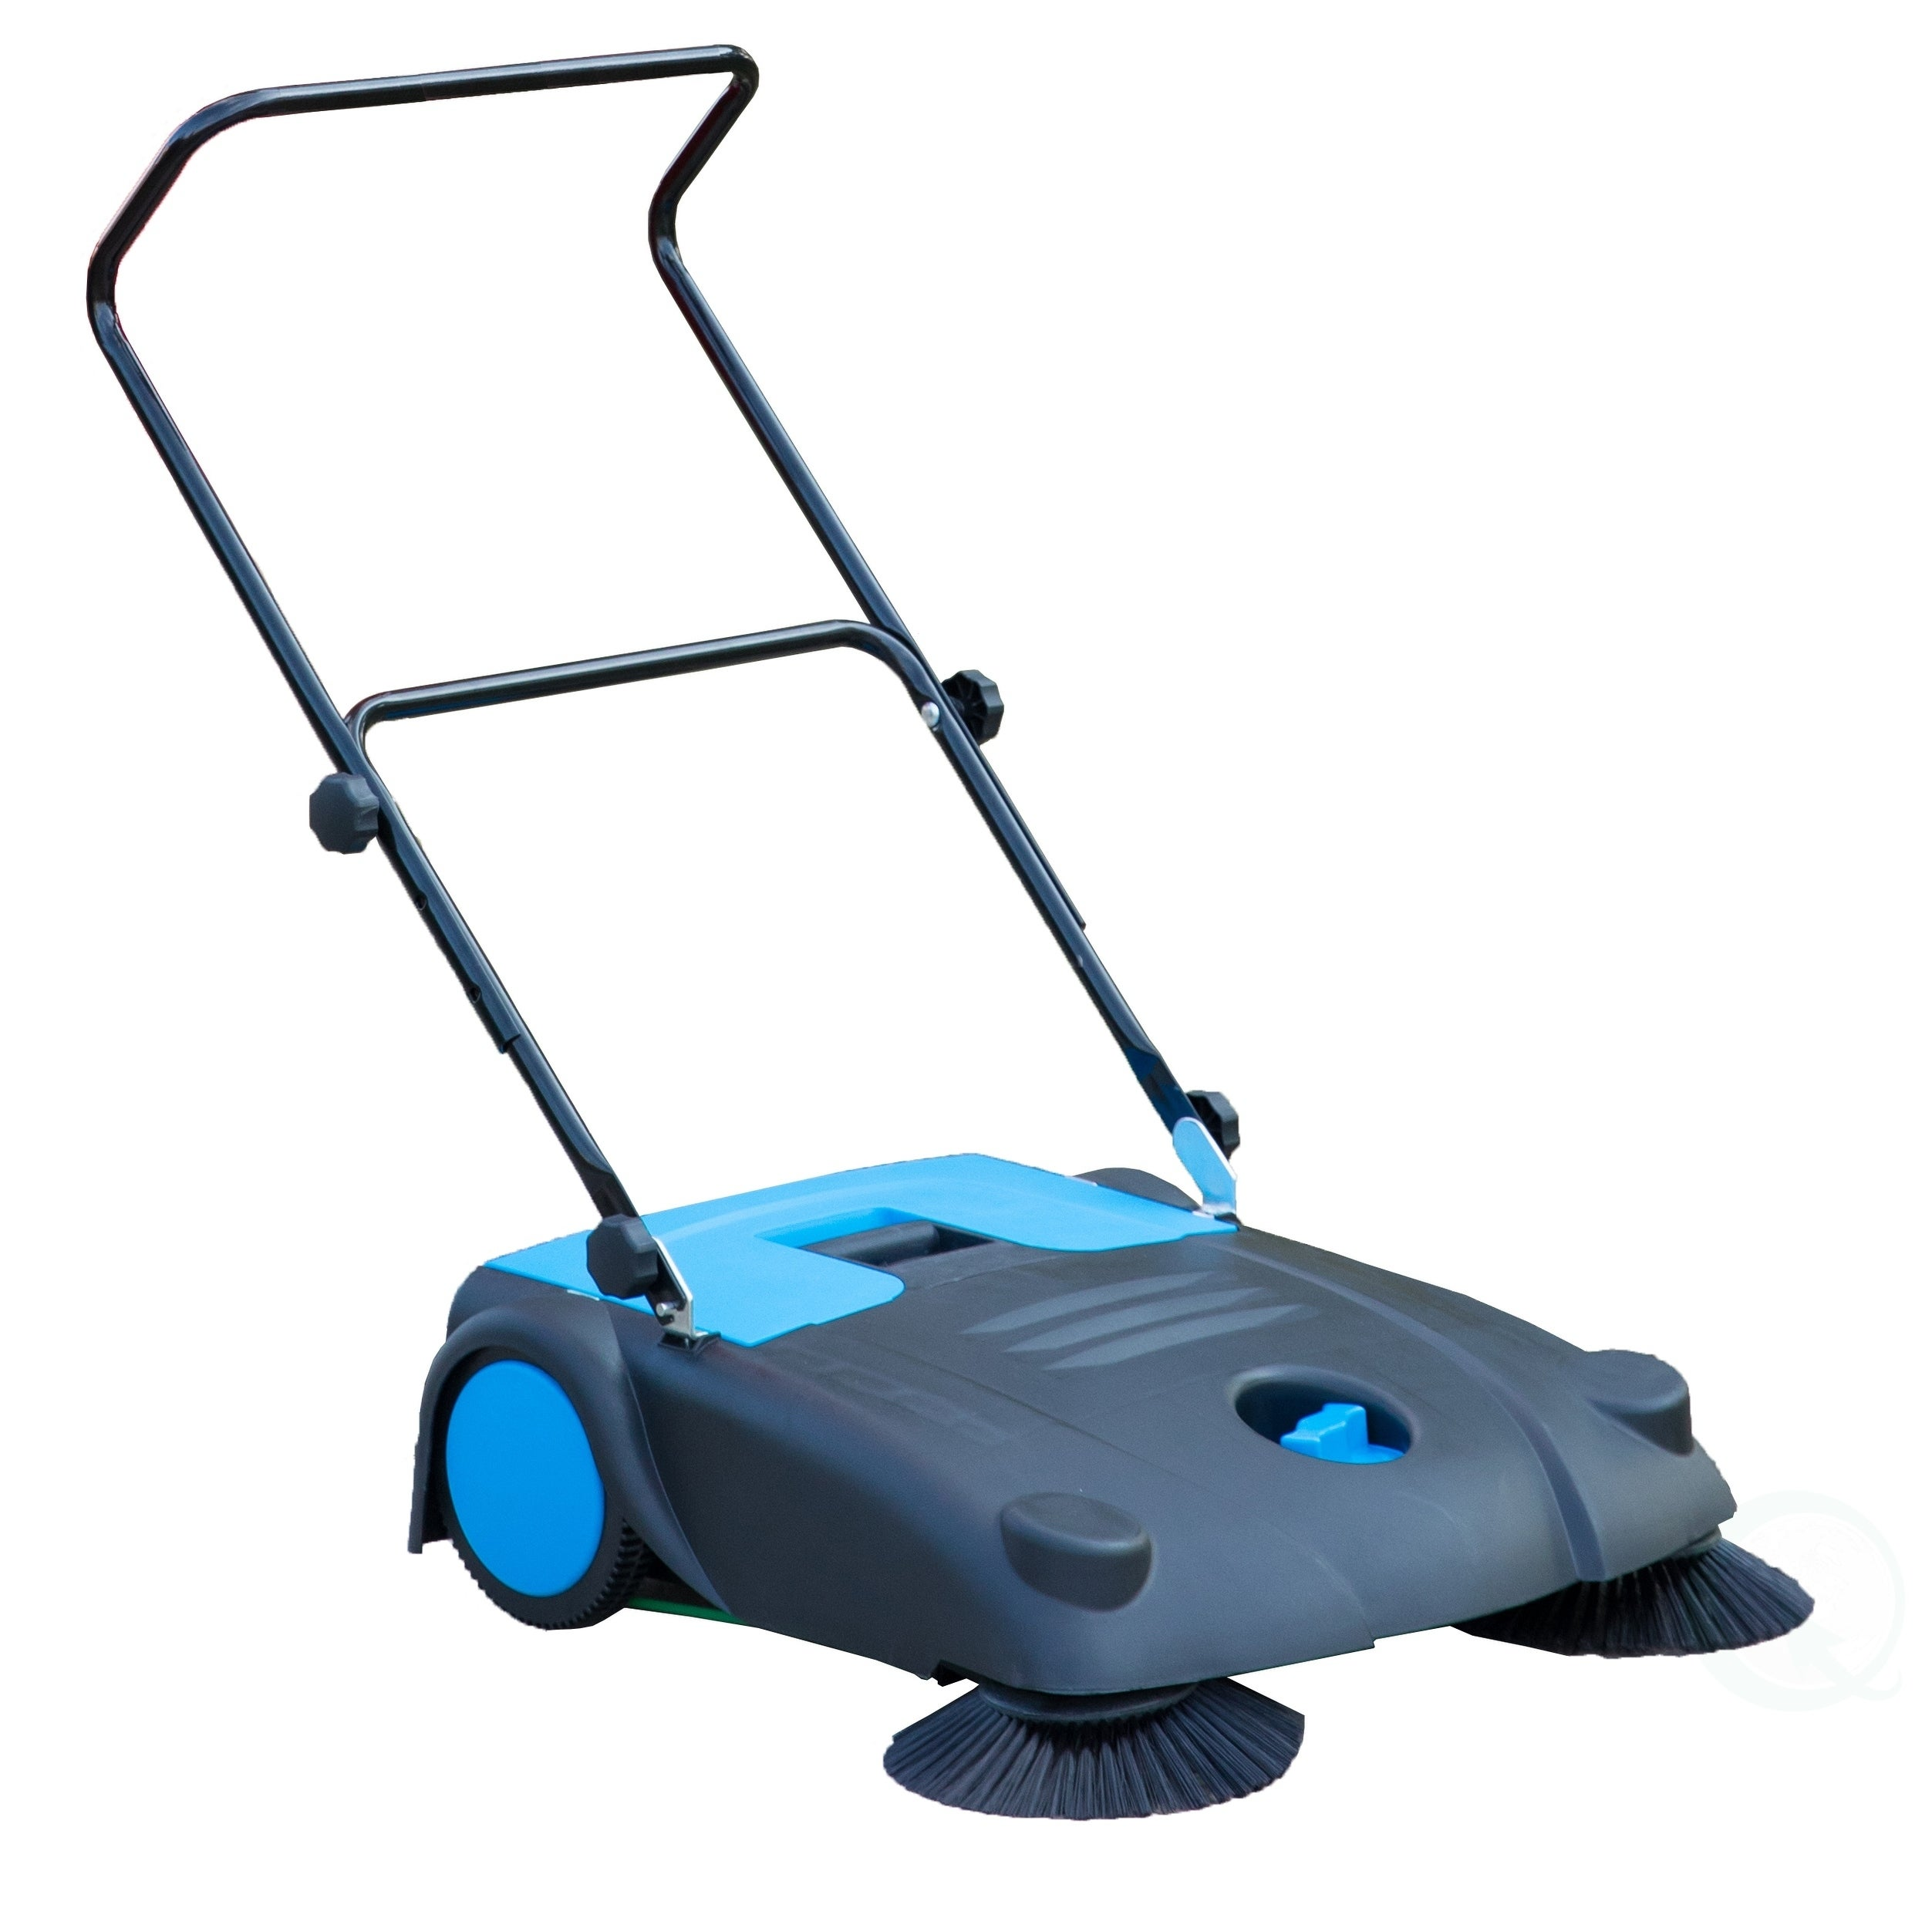 Manual Floor Sweeper With Side Brooms